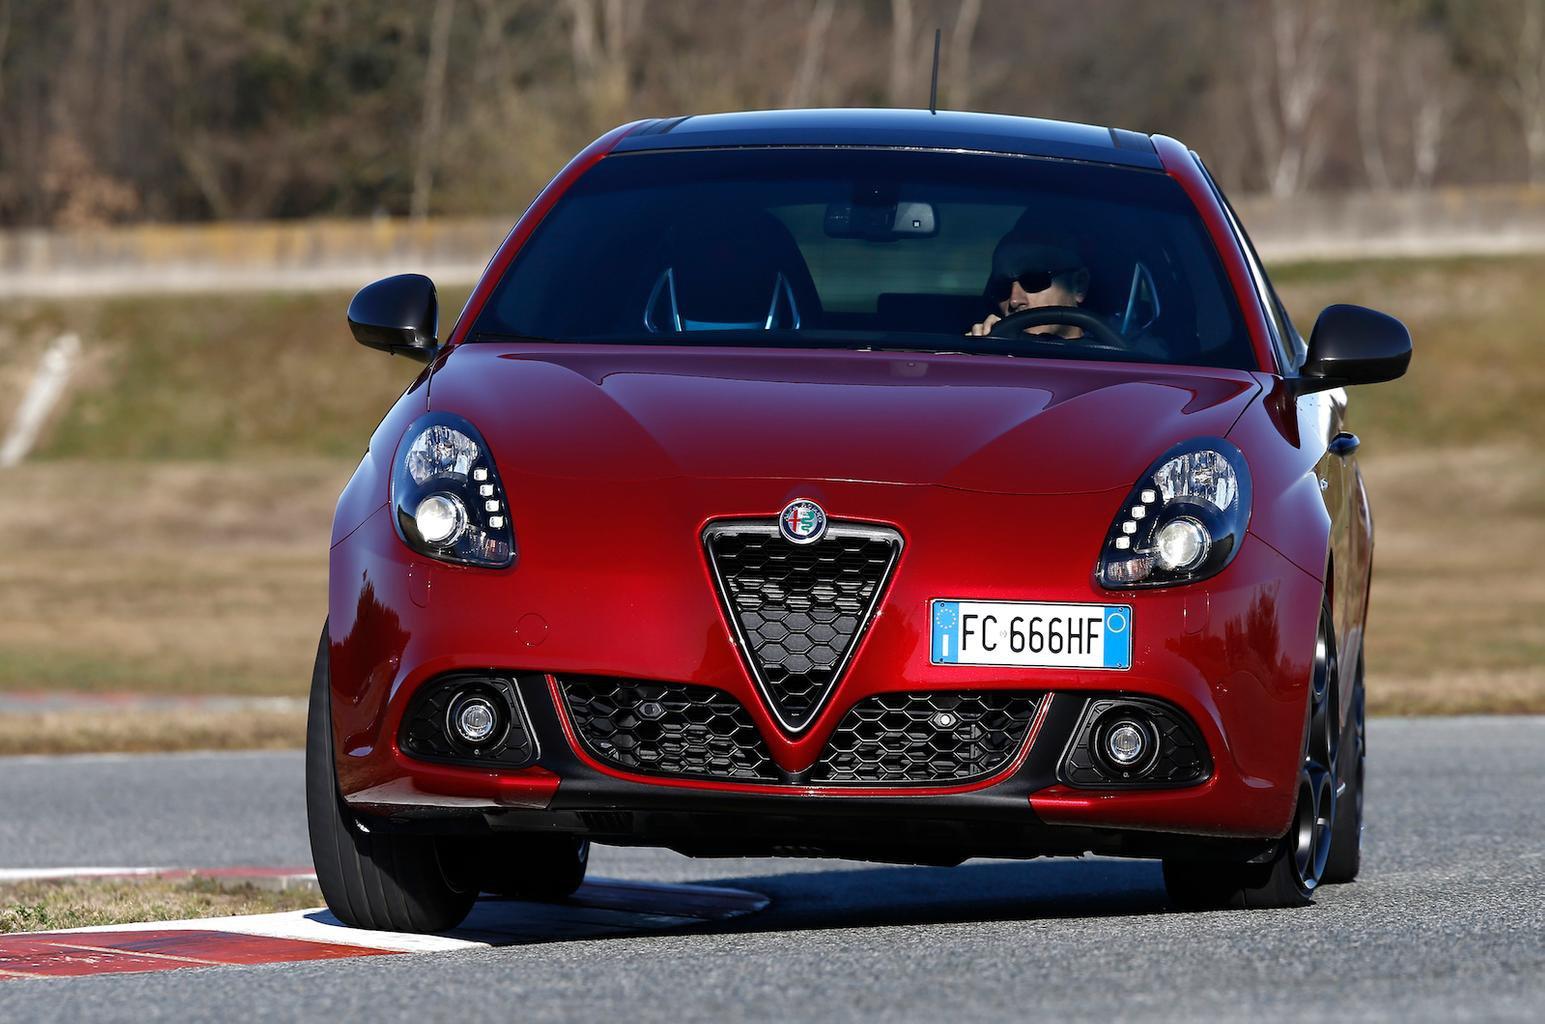 2016 Alfa Romeo Giulietta 1.6 JDTm review